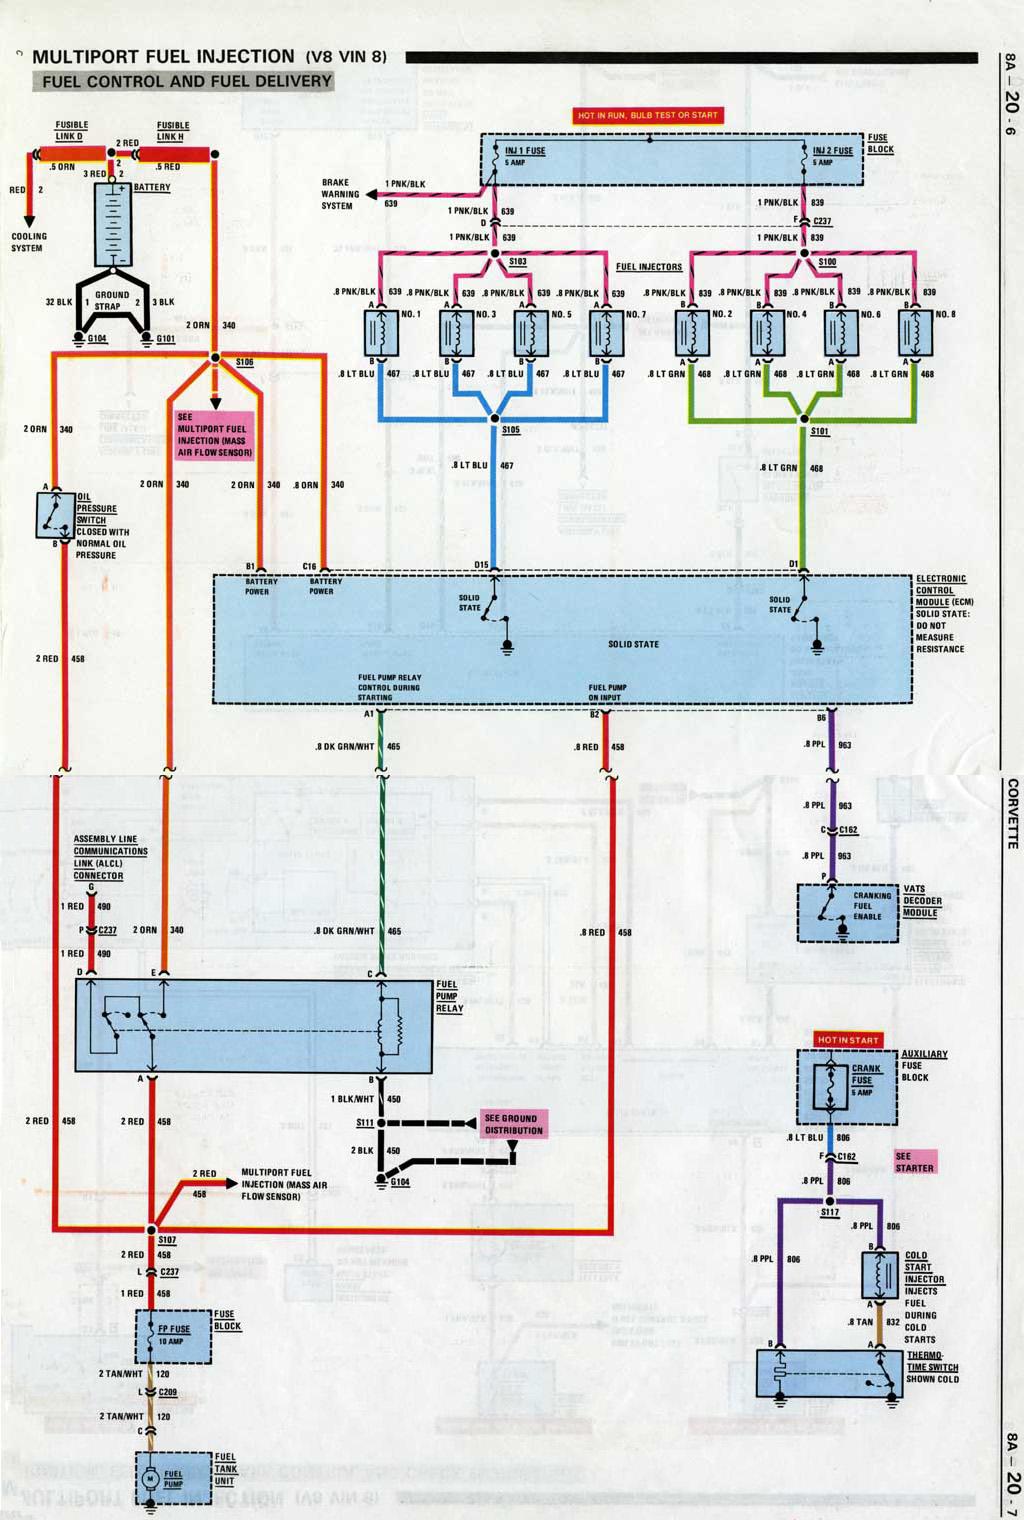 1986_Corvette_Fuel_Delivery?resize\\\\\\\=665%2C987 2001 corvette wiring diagram c5 corvette stereo wiring diagram 86 Corvette Cooling Fan Wiring Diagram at suagrazia.org